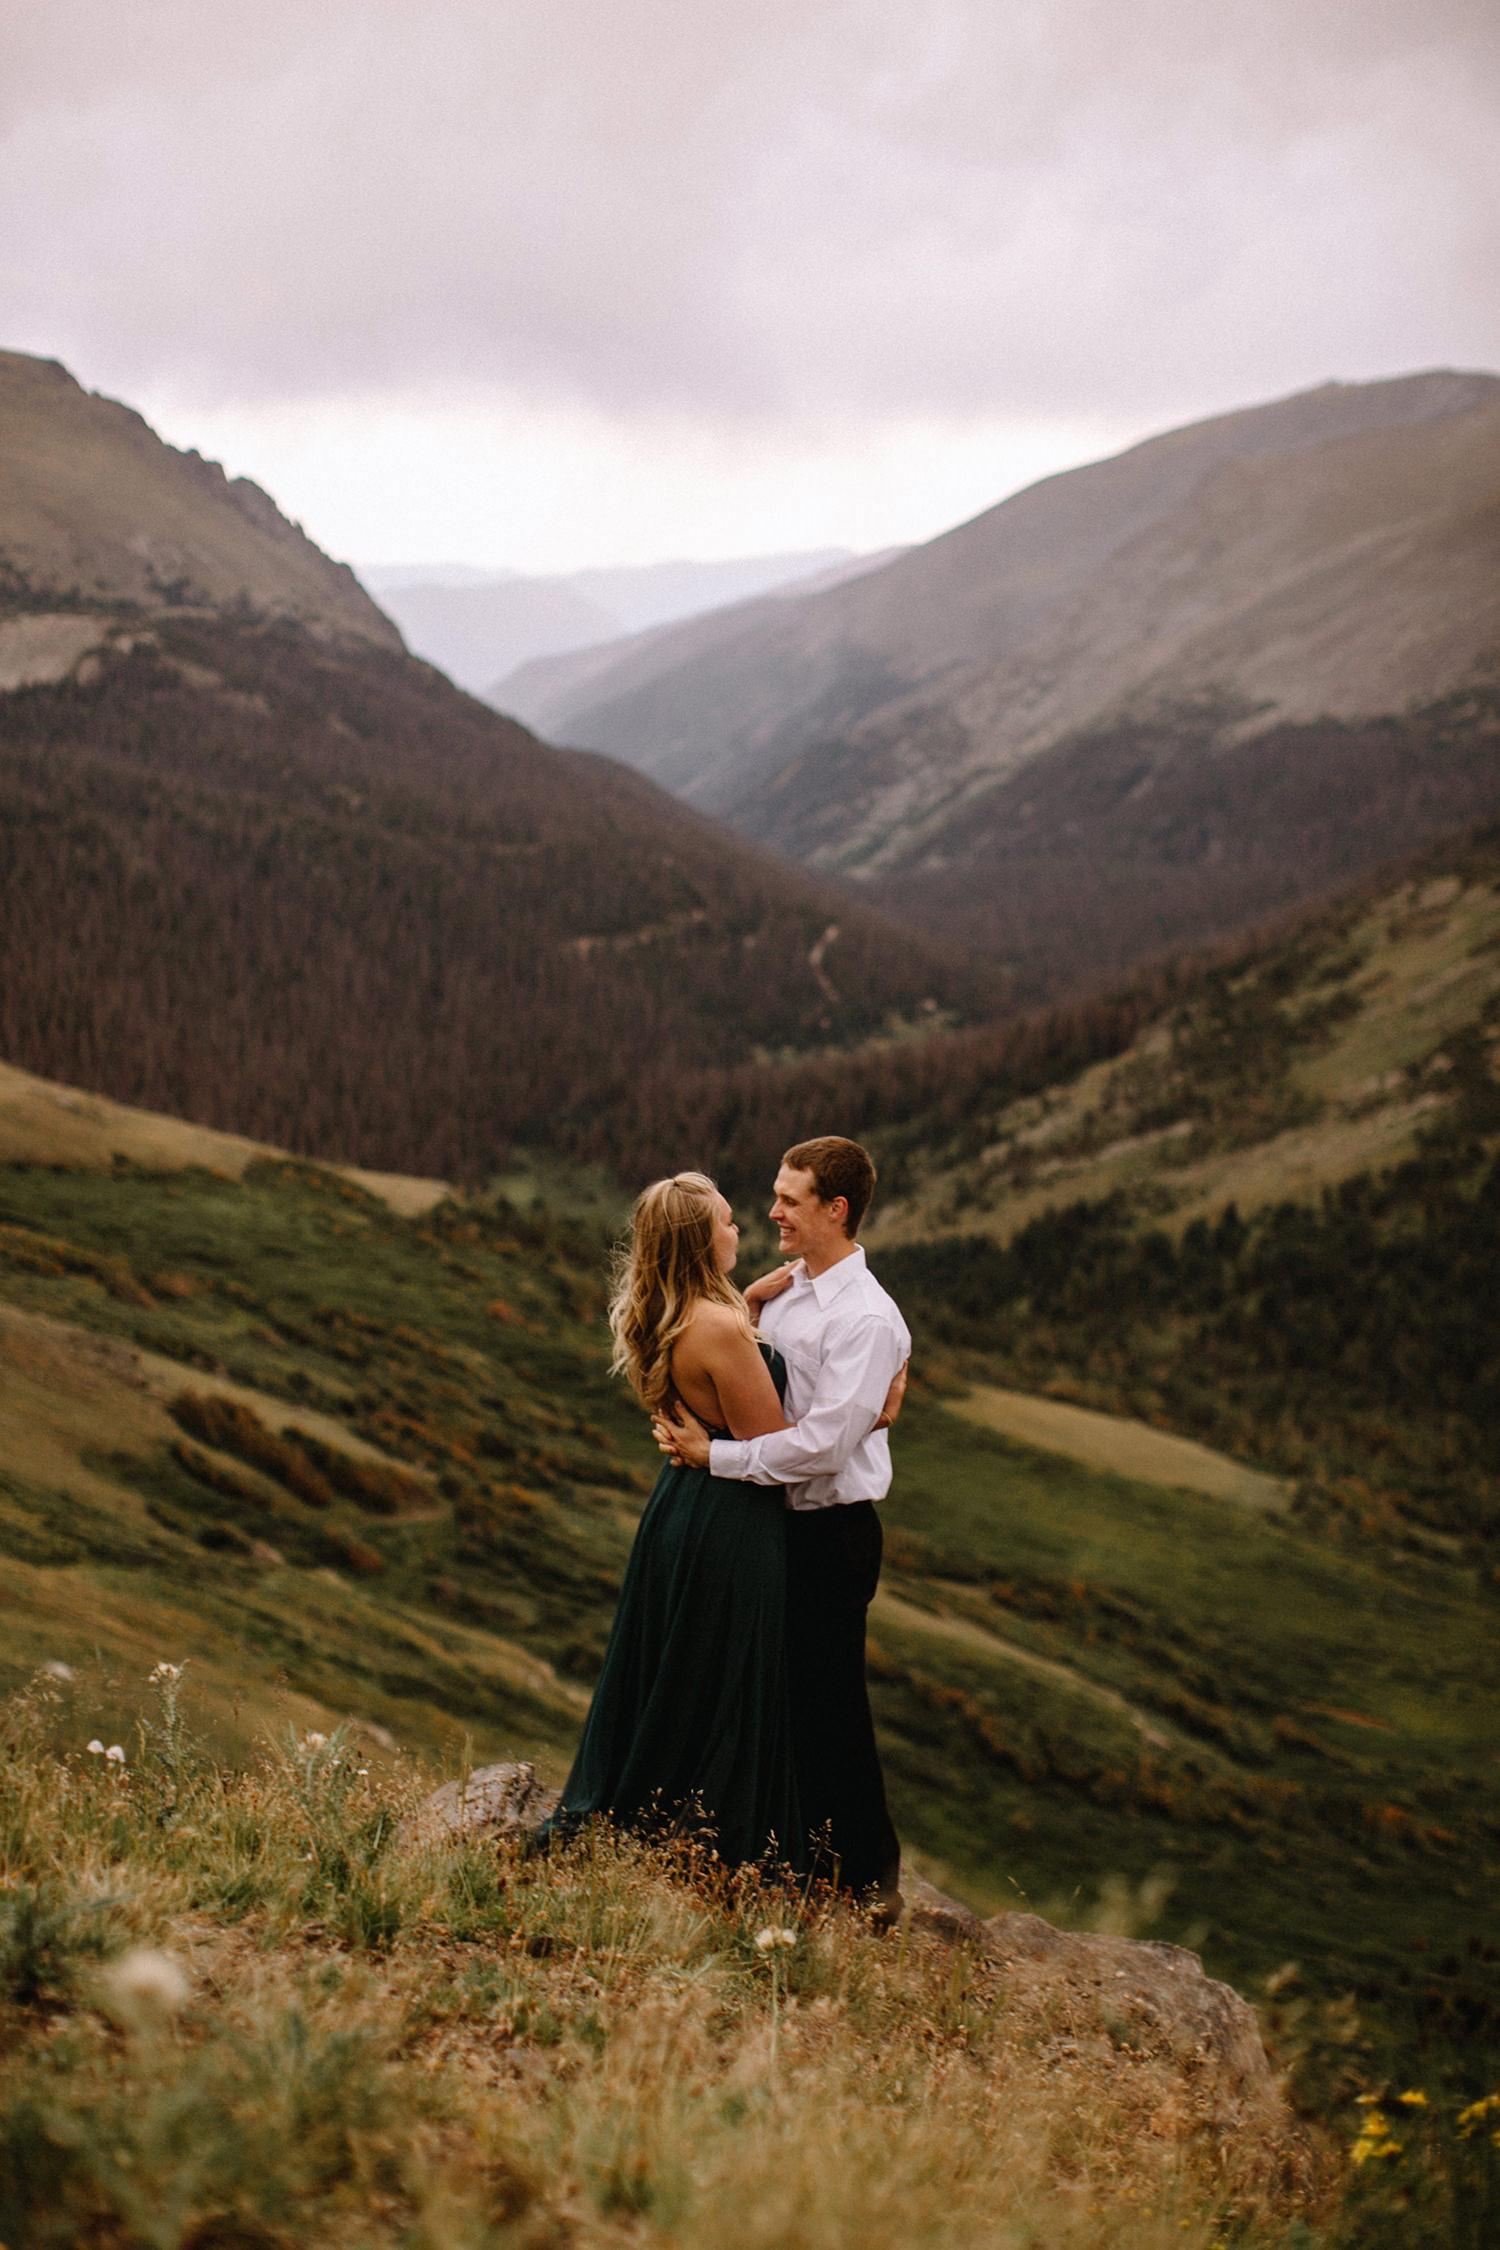 Rocky Mountain Engagement National Park Engaged Photos Wedding Elopement Portrait Mountains Trail Ridge Rd Peak Alpine Dress Lulus Rules Permit Photo Adventure Love Couples Destination Liz Osban photography Cheyenne Wyoming24.jpg